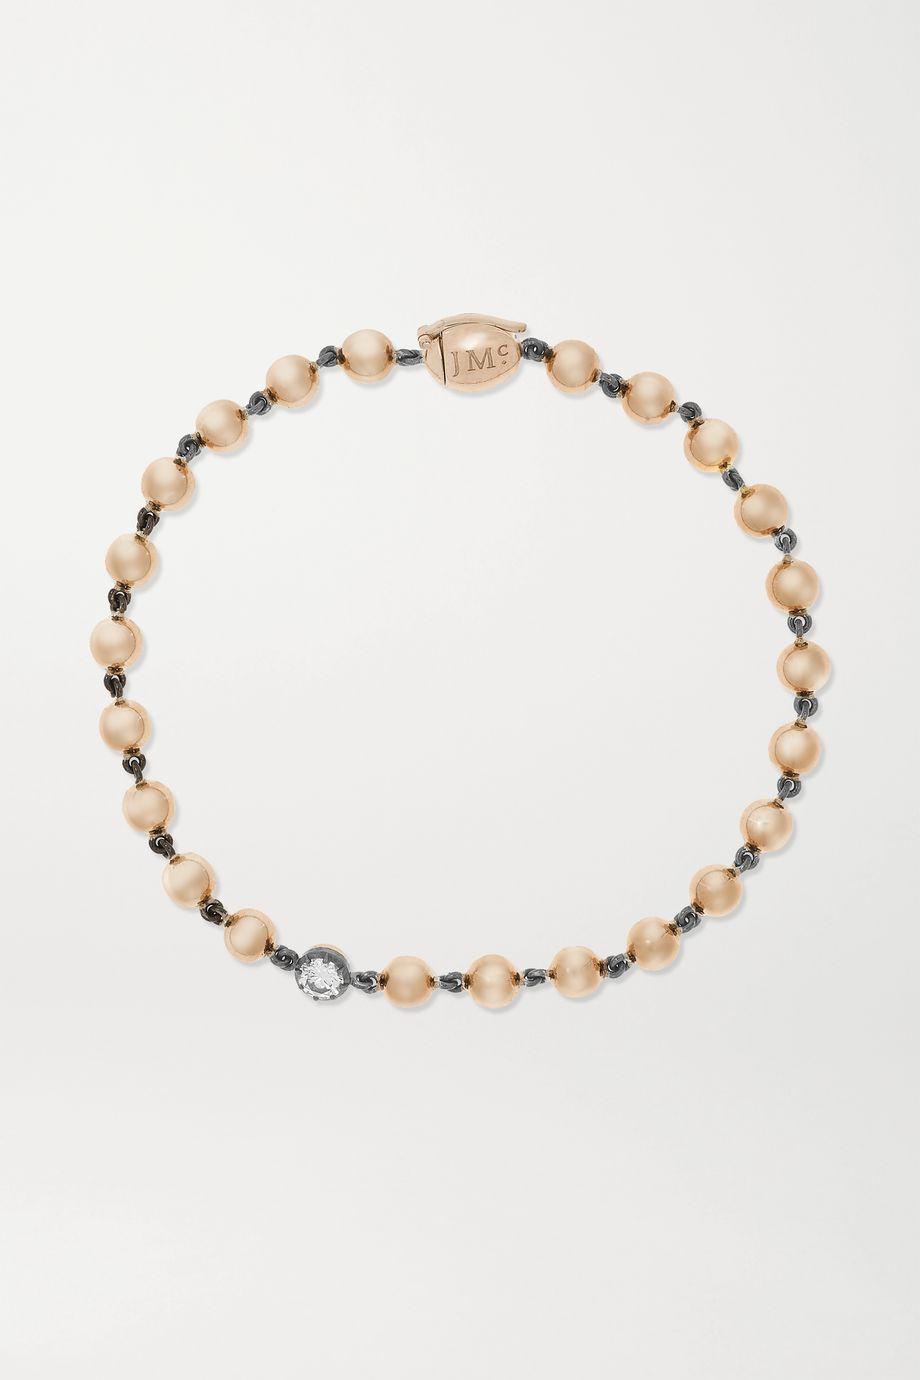 Jessica McCormack Ball n Chain 18-karat rose gold and blackened platinum diamond bracelet